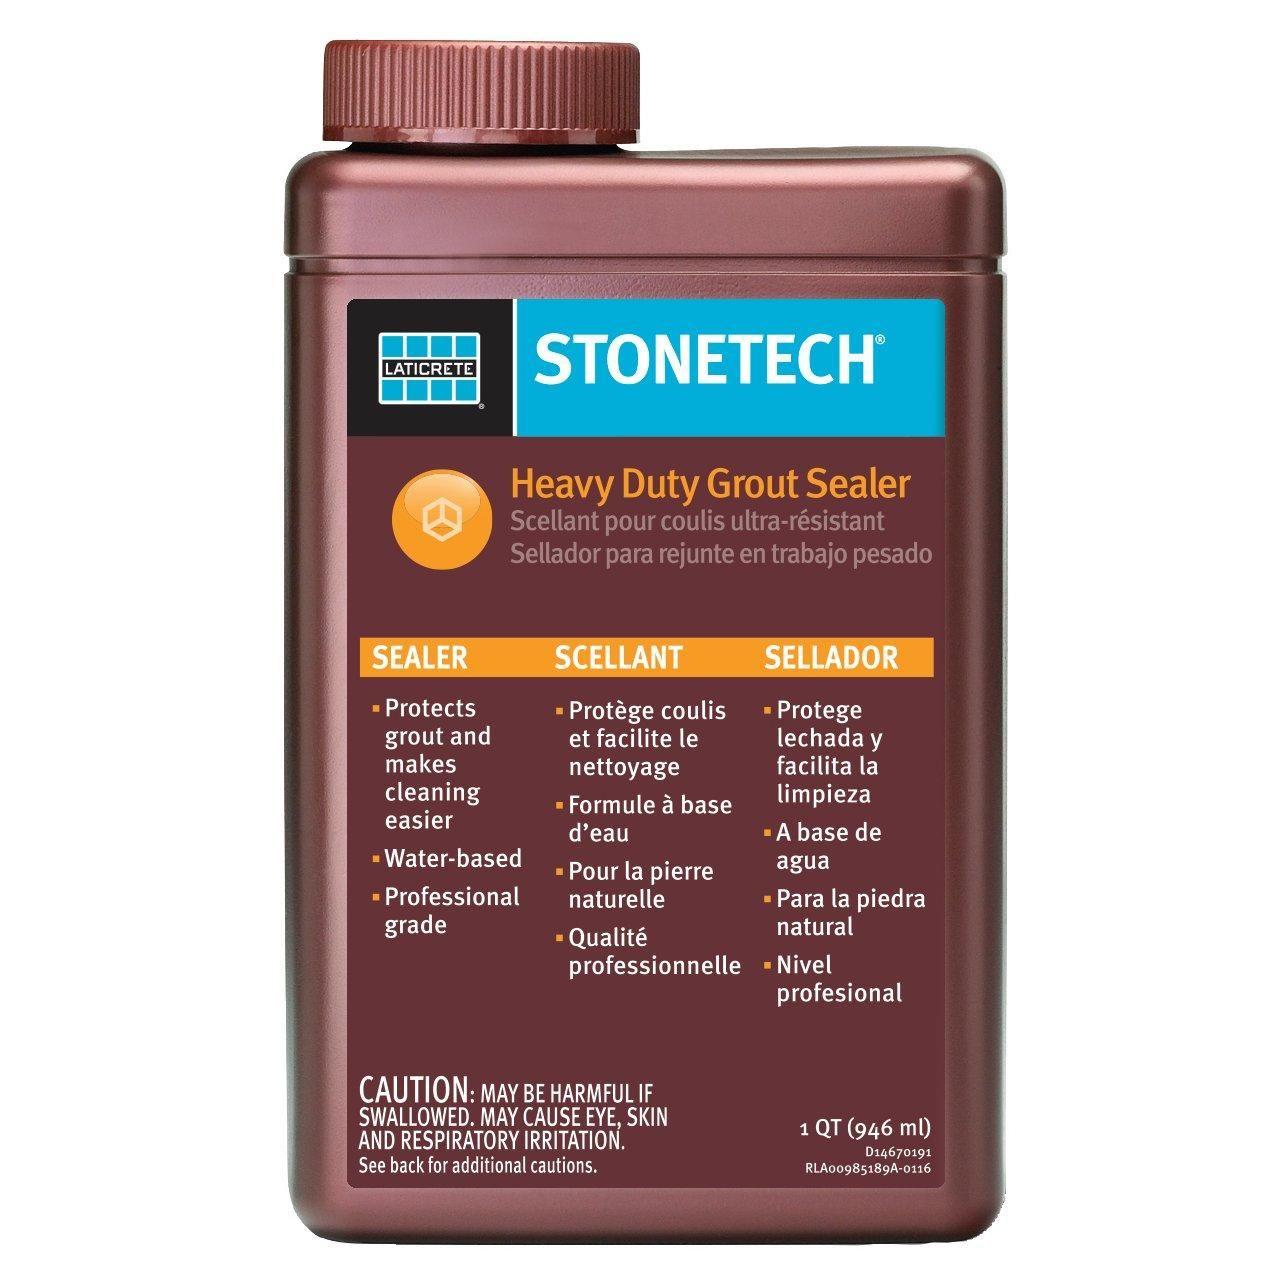 Laticrete Stonetech Professional Heavy Duty Grout Sealer For Ceramic Tile In 2020 Grout Sealer Best Grout Sealer Best Granite Sealer